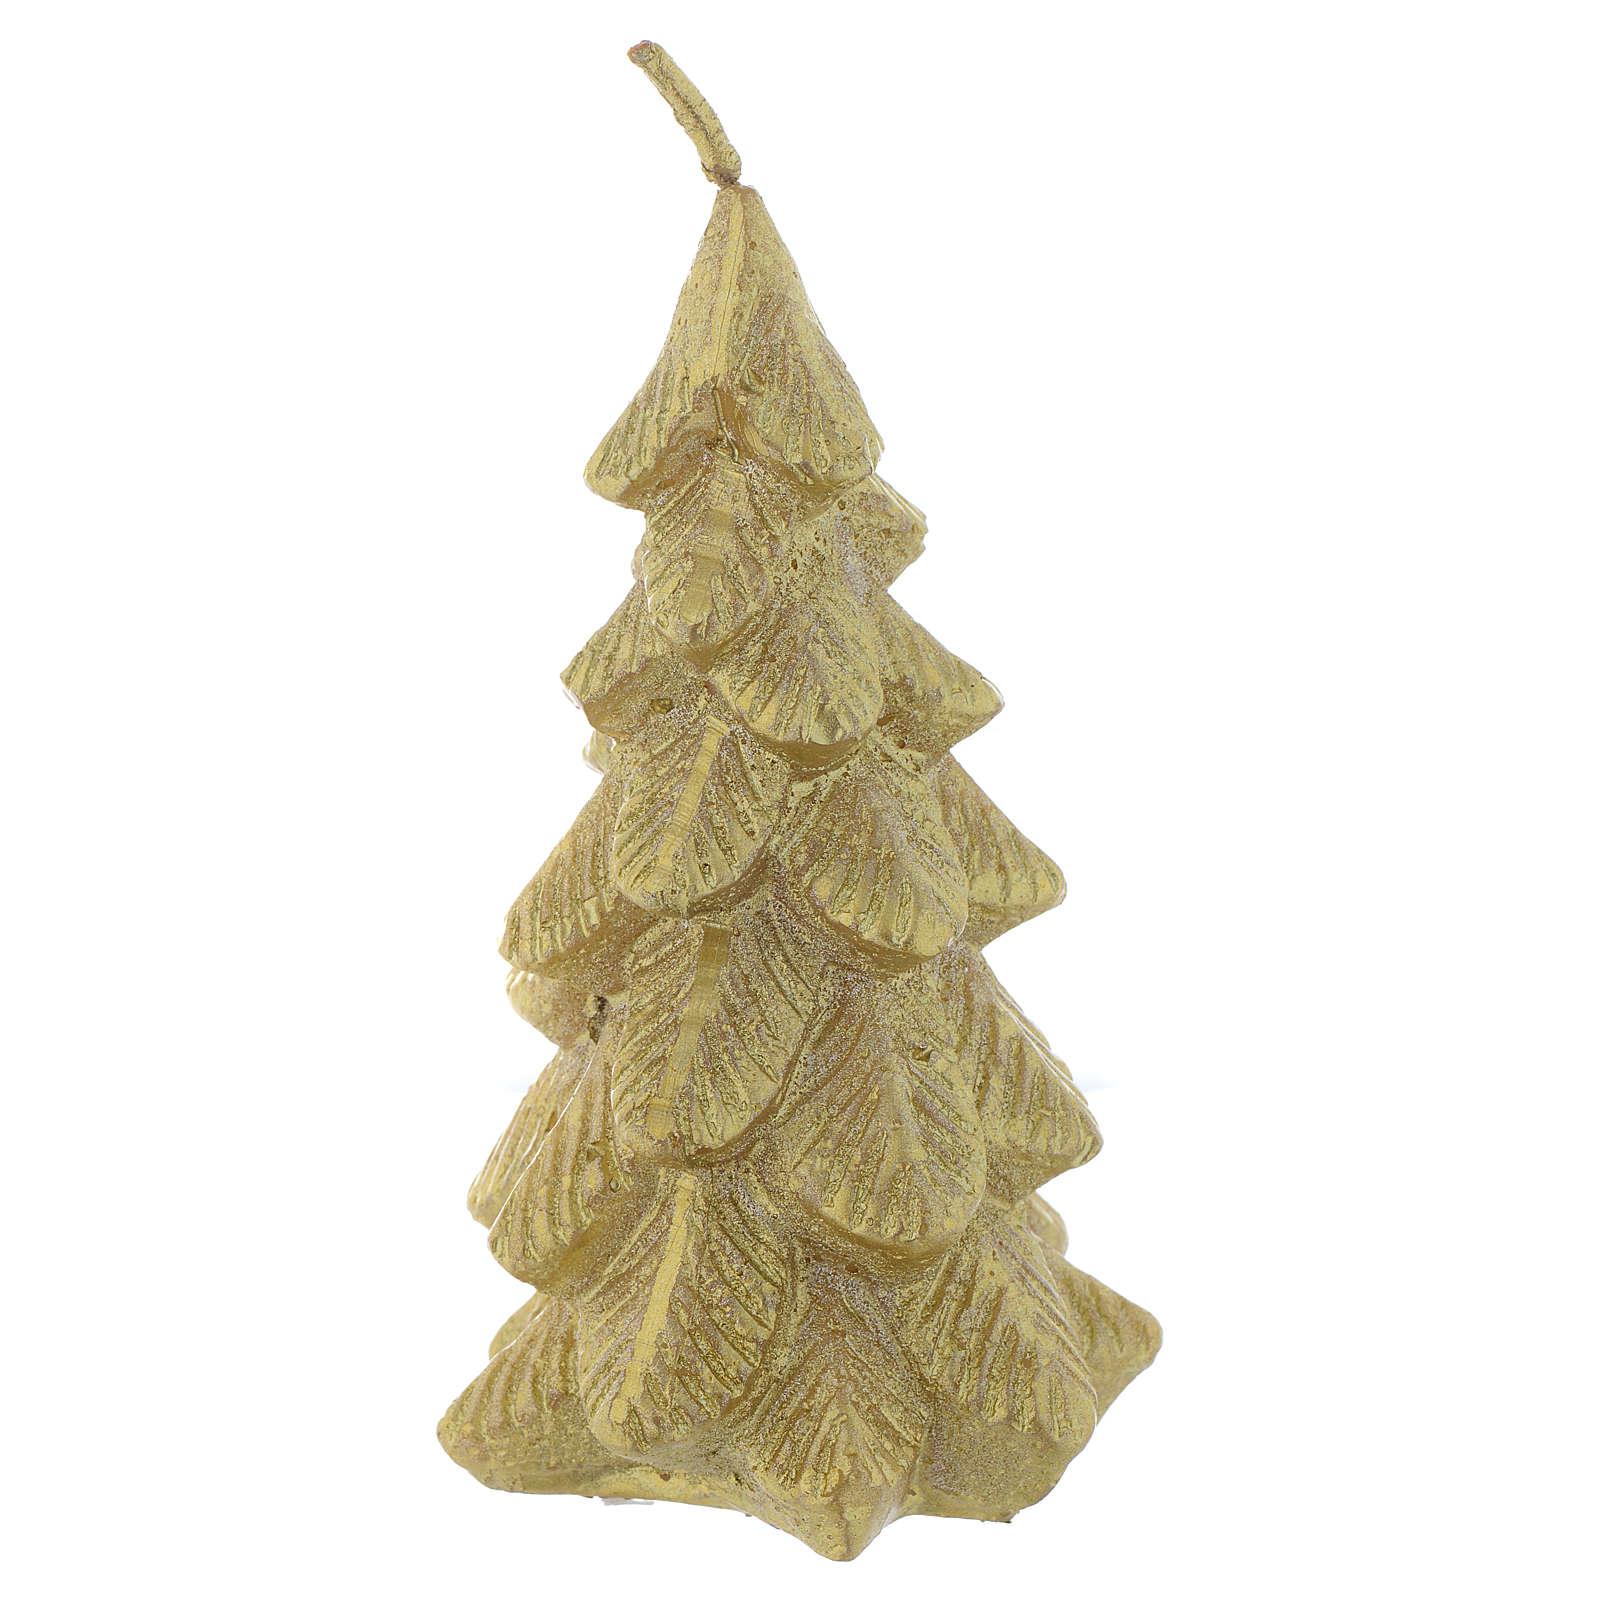 Vela Árbol de Navidad dorada 11 cm 3